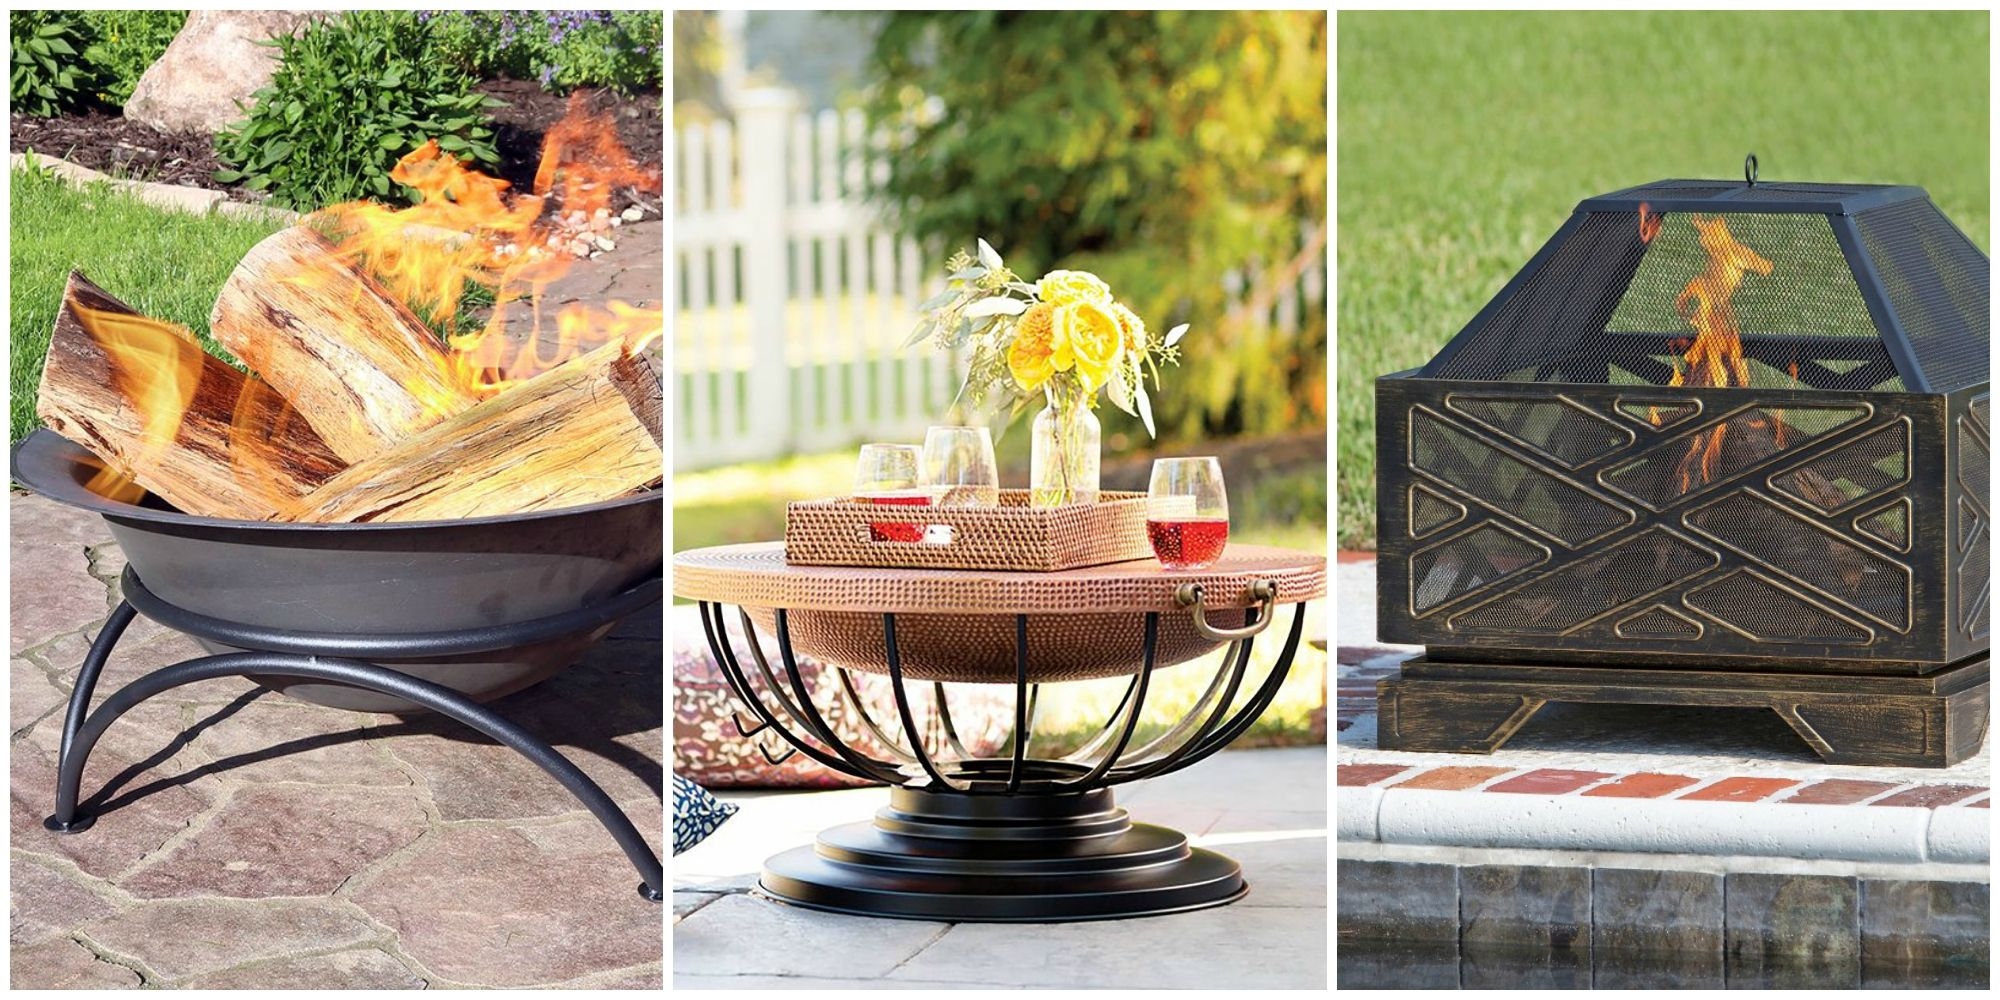 16 Best Outdoor Fire Pit Ideas Fun Backyard Fire Pits